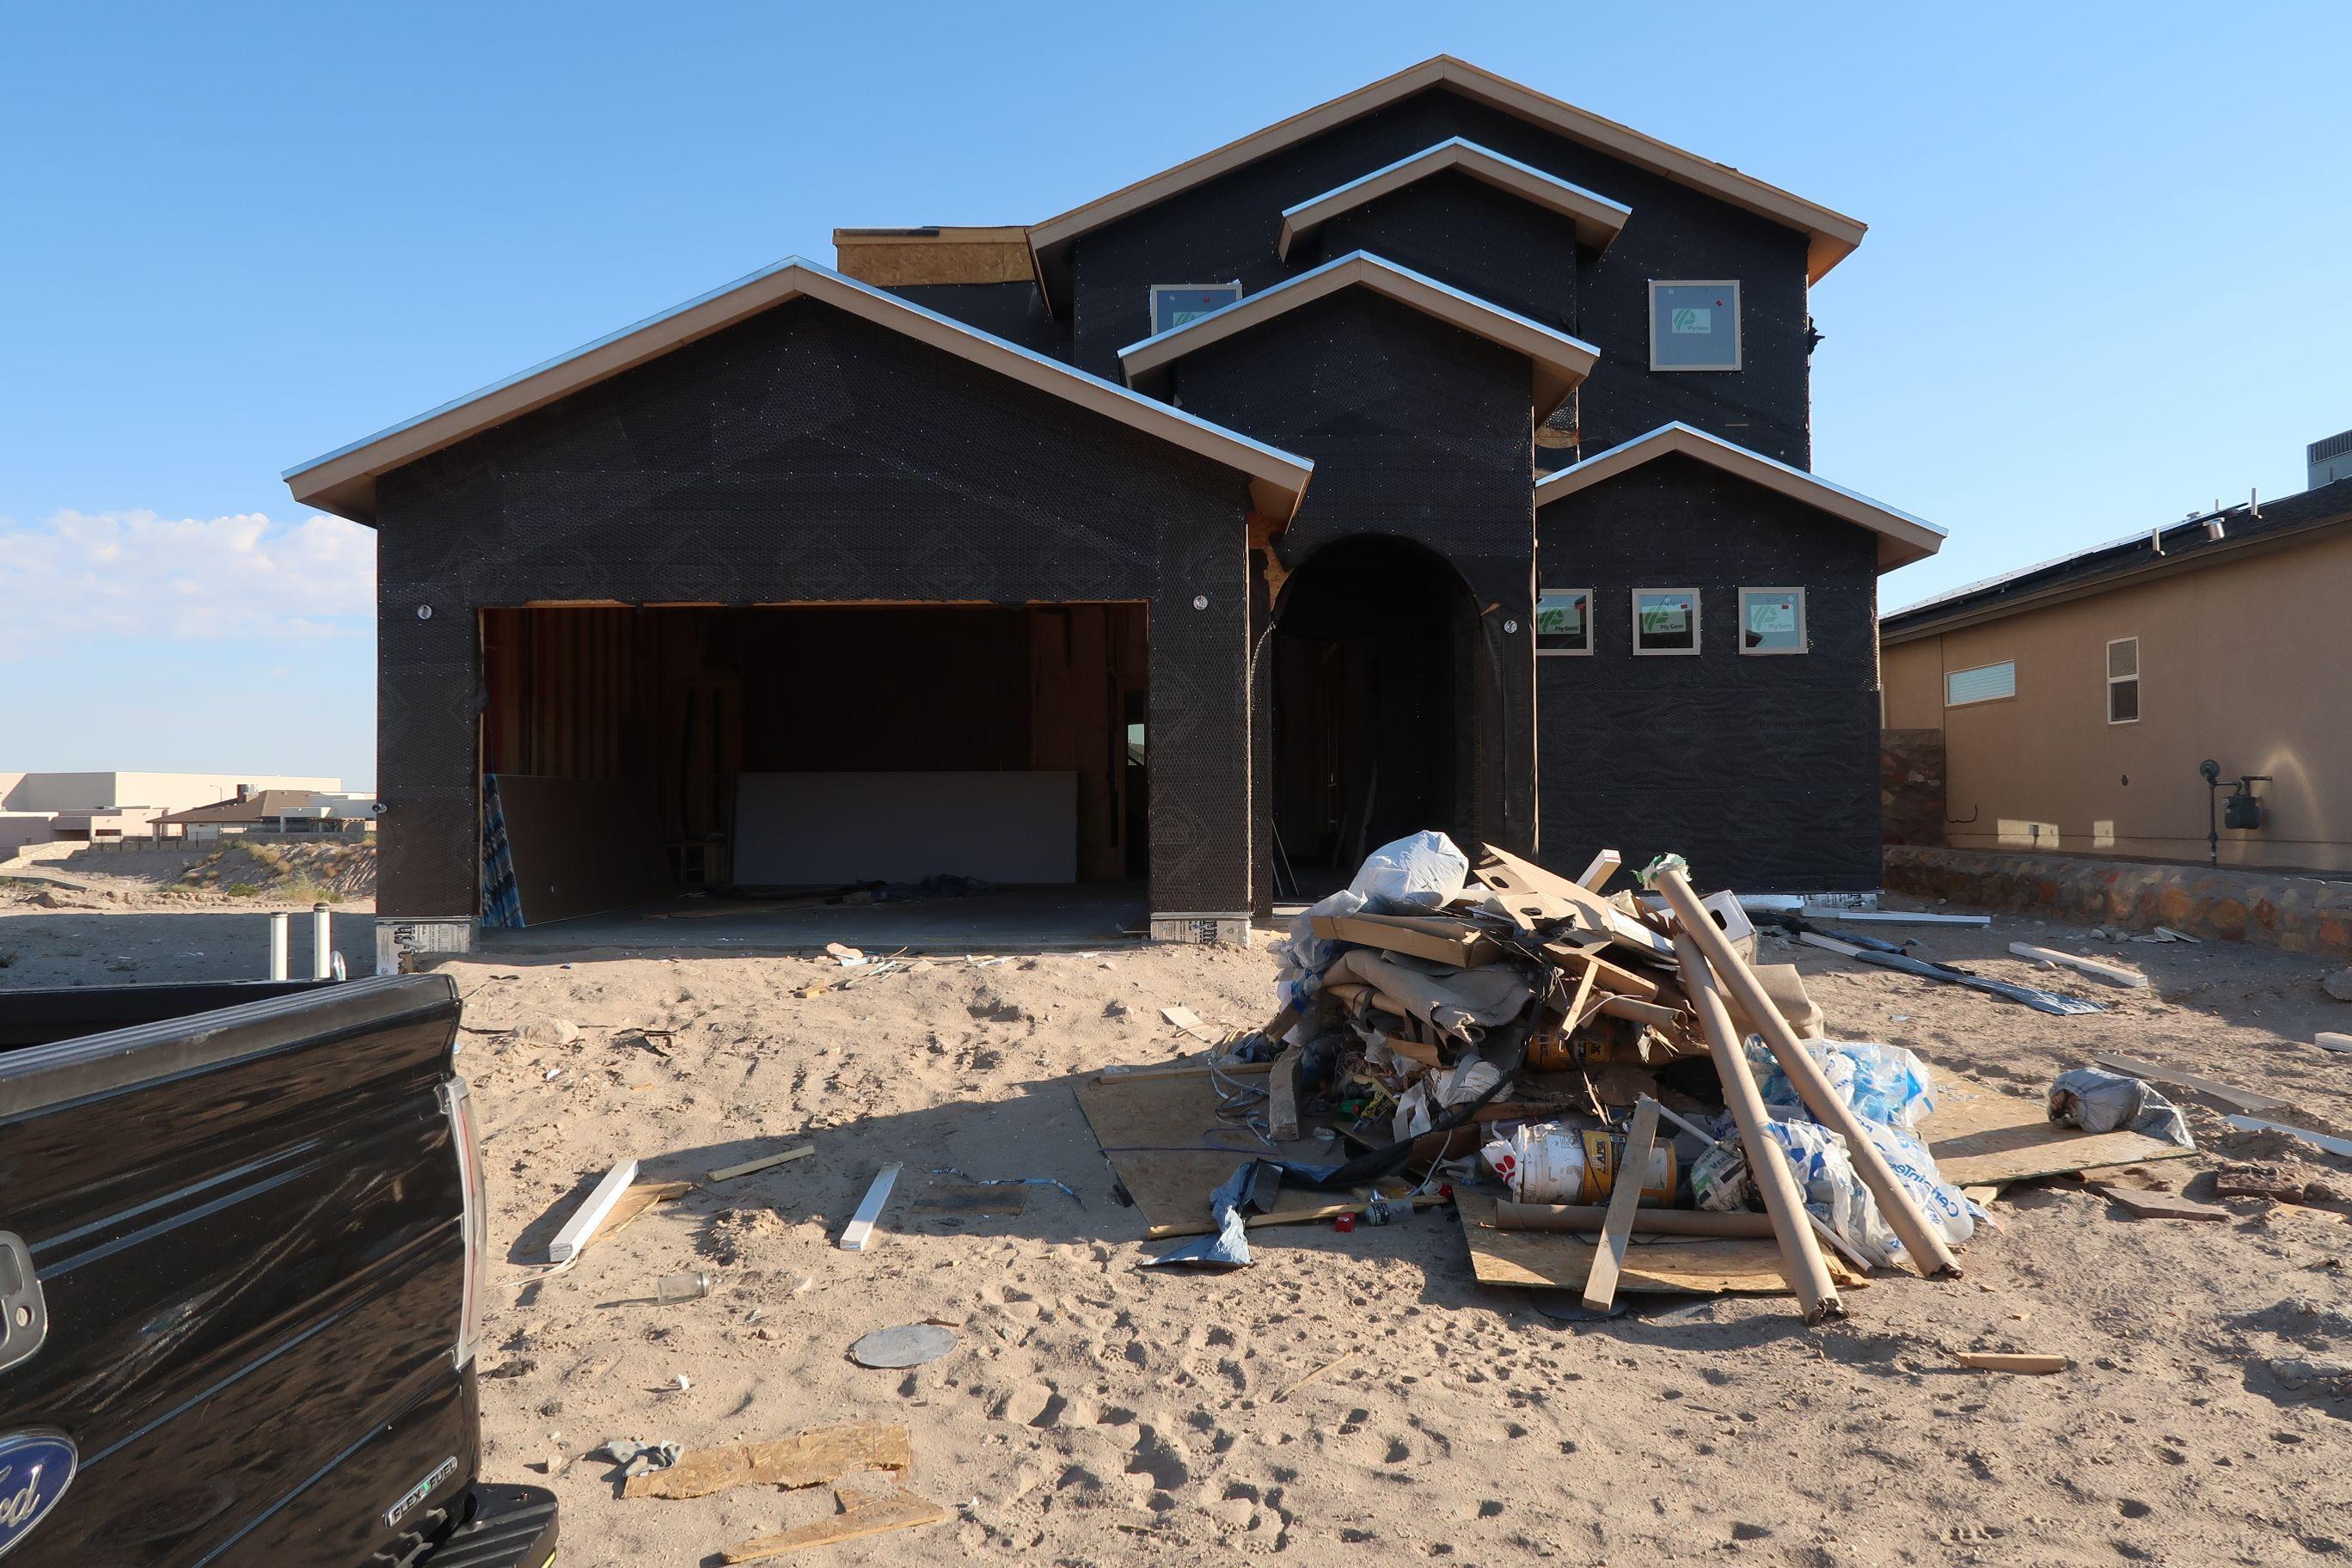 7825 Enchanted View, El Paso, Texas 79911, 3 Bedrooms Bedrooms, ,2 BathroomsBathrooms,Residential,For sale,Enchanted View,816906